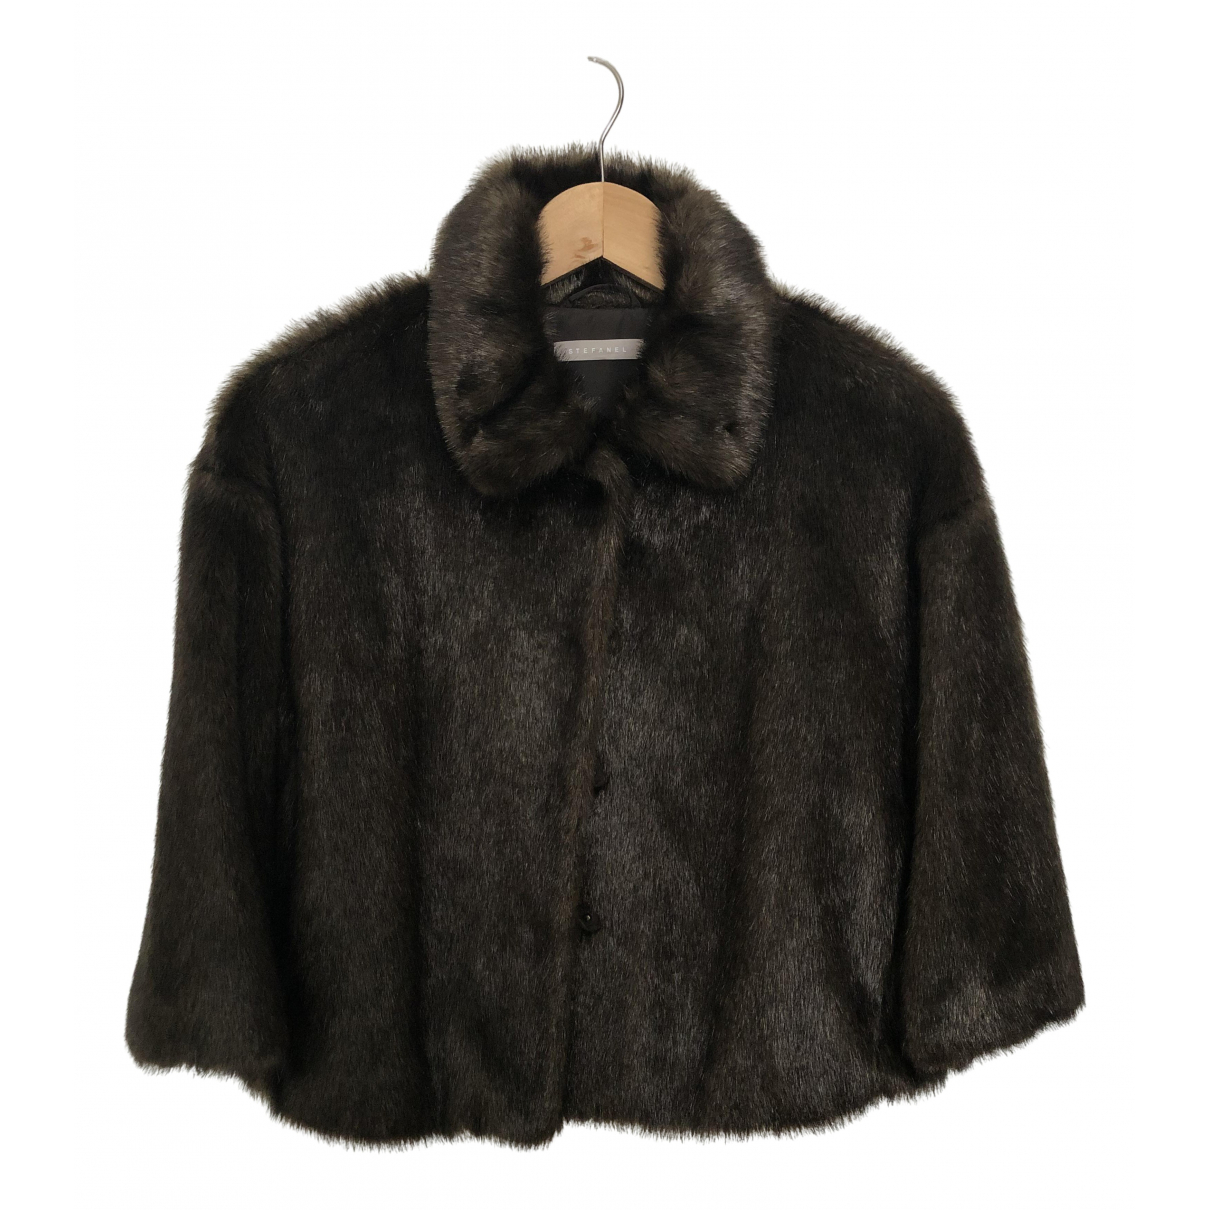 Stefanel \N Brown Faux fur jacket for Women S International